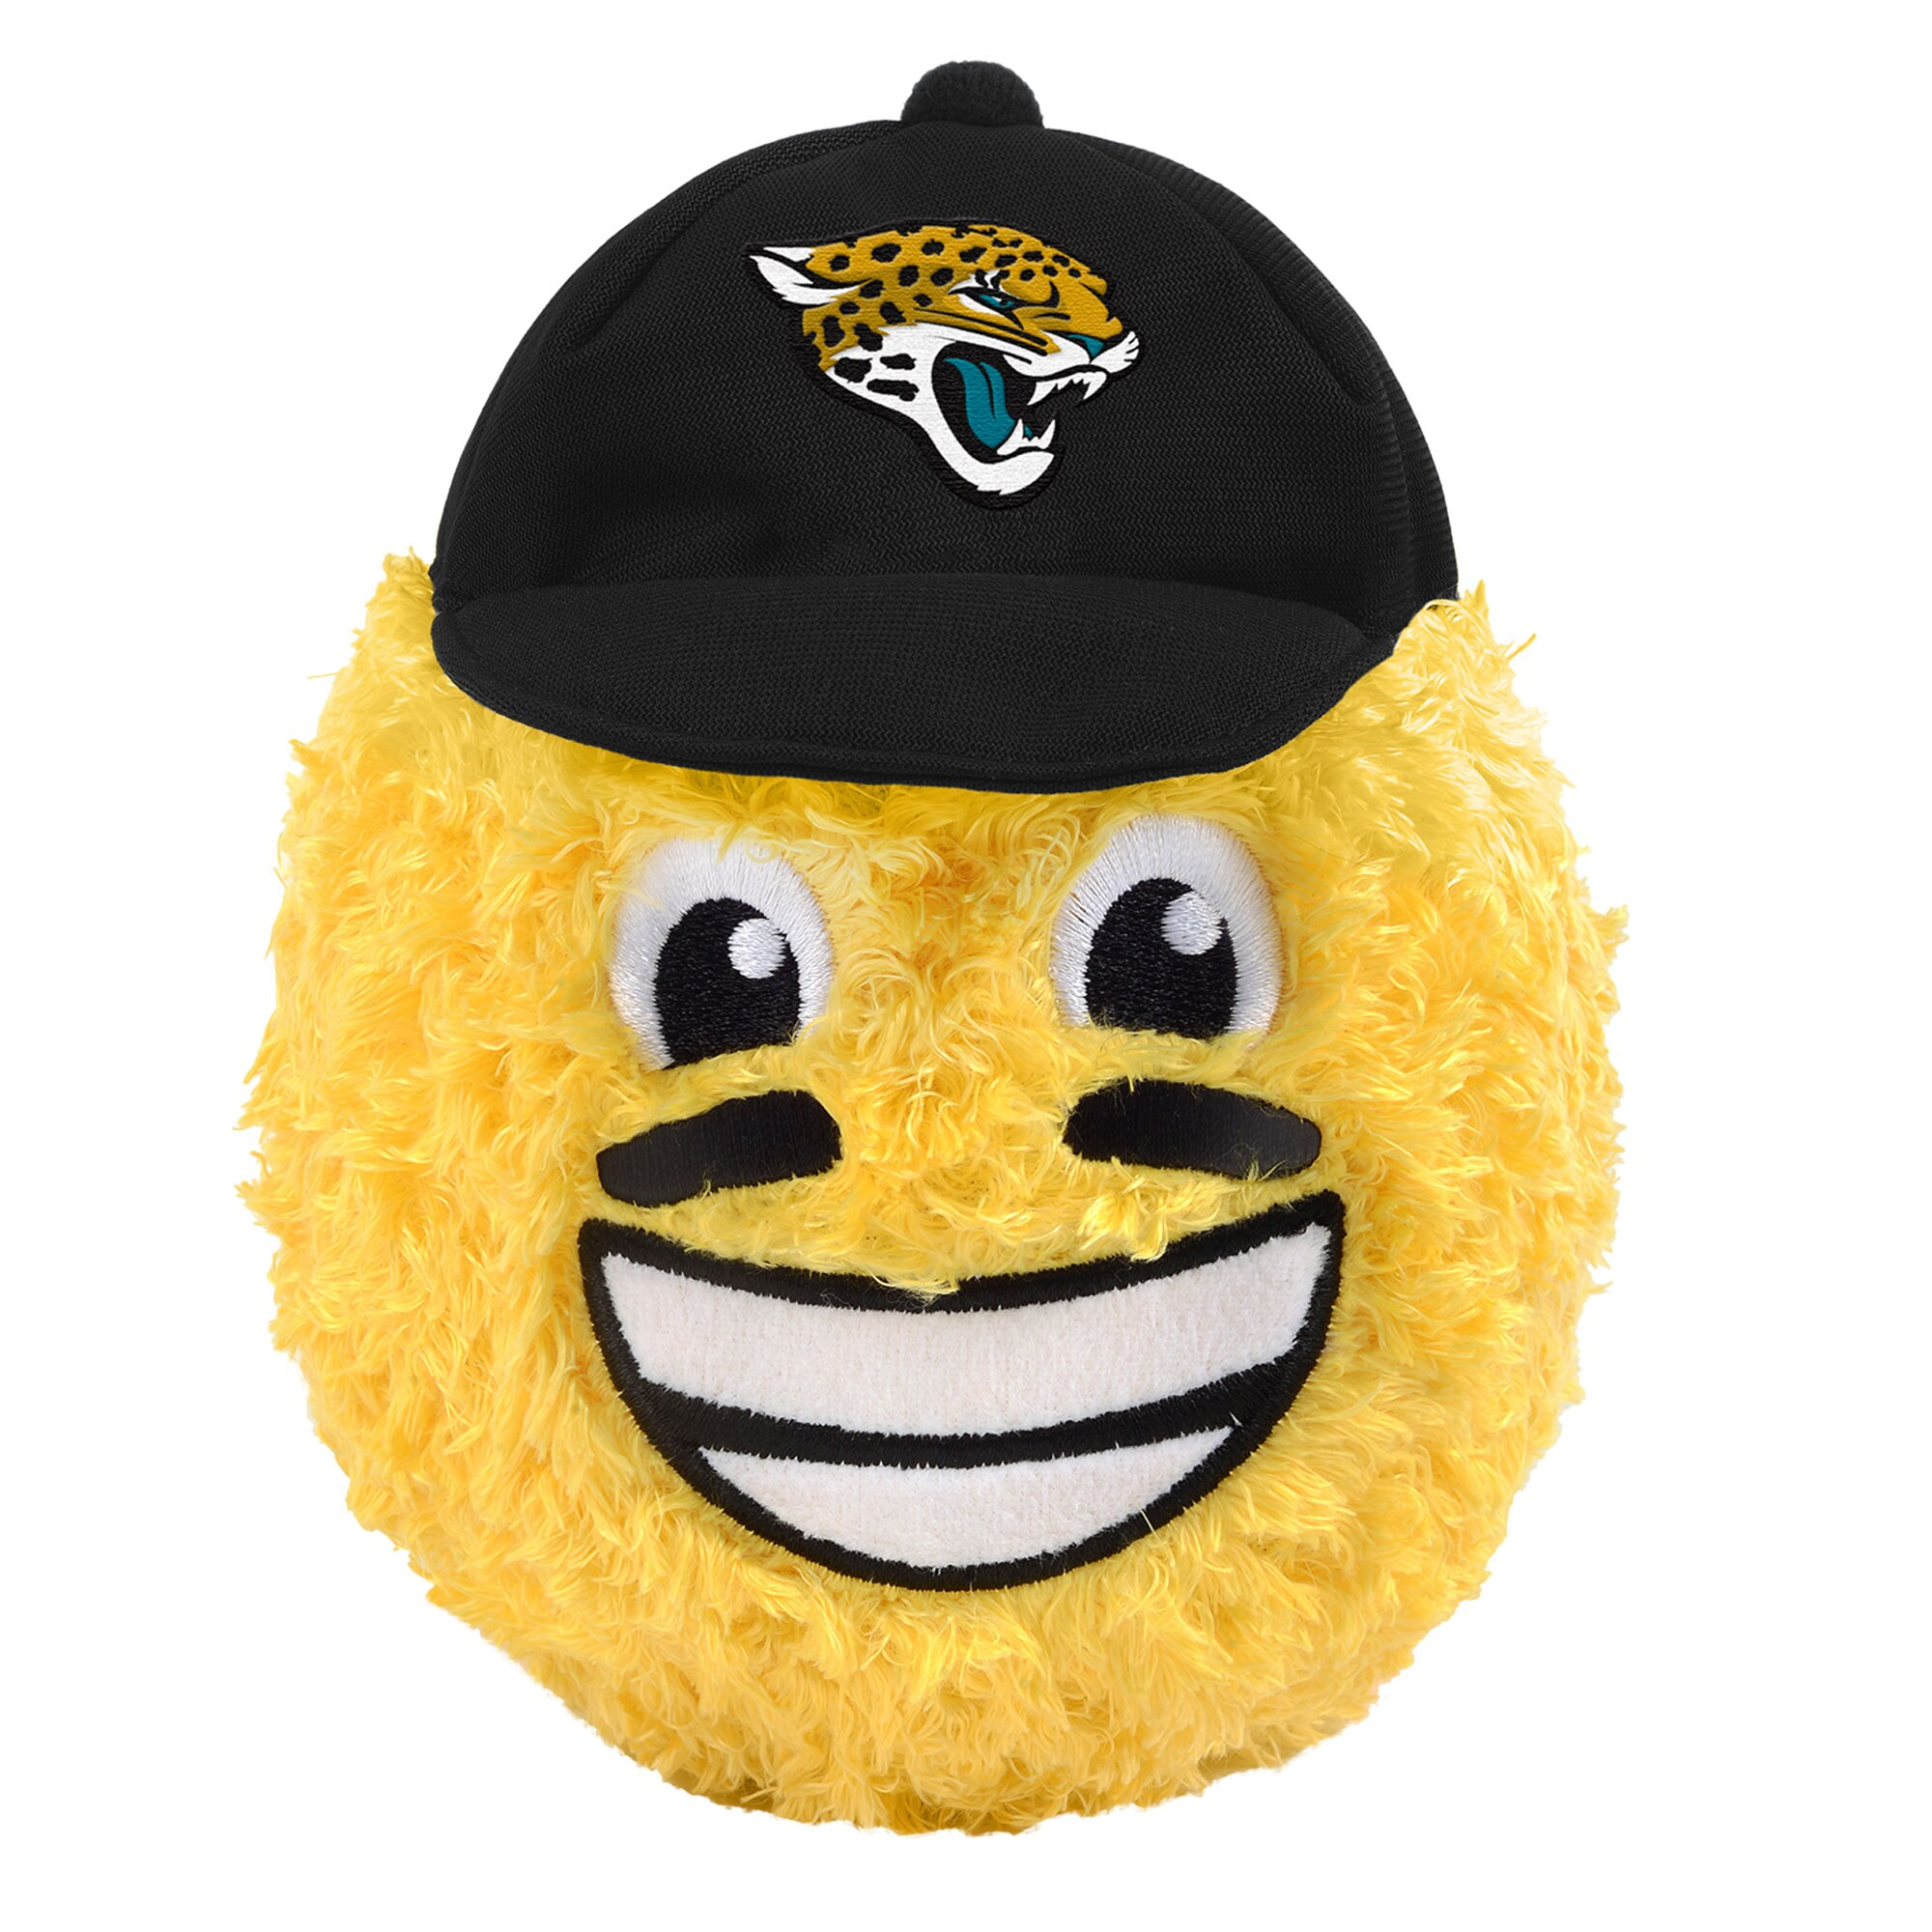 "Jacksonville Jaguars 5"" Eye Black Teamoji Plush Toy"